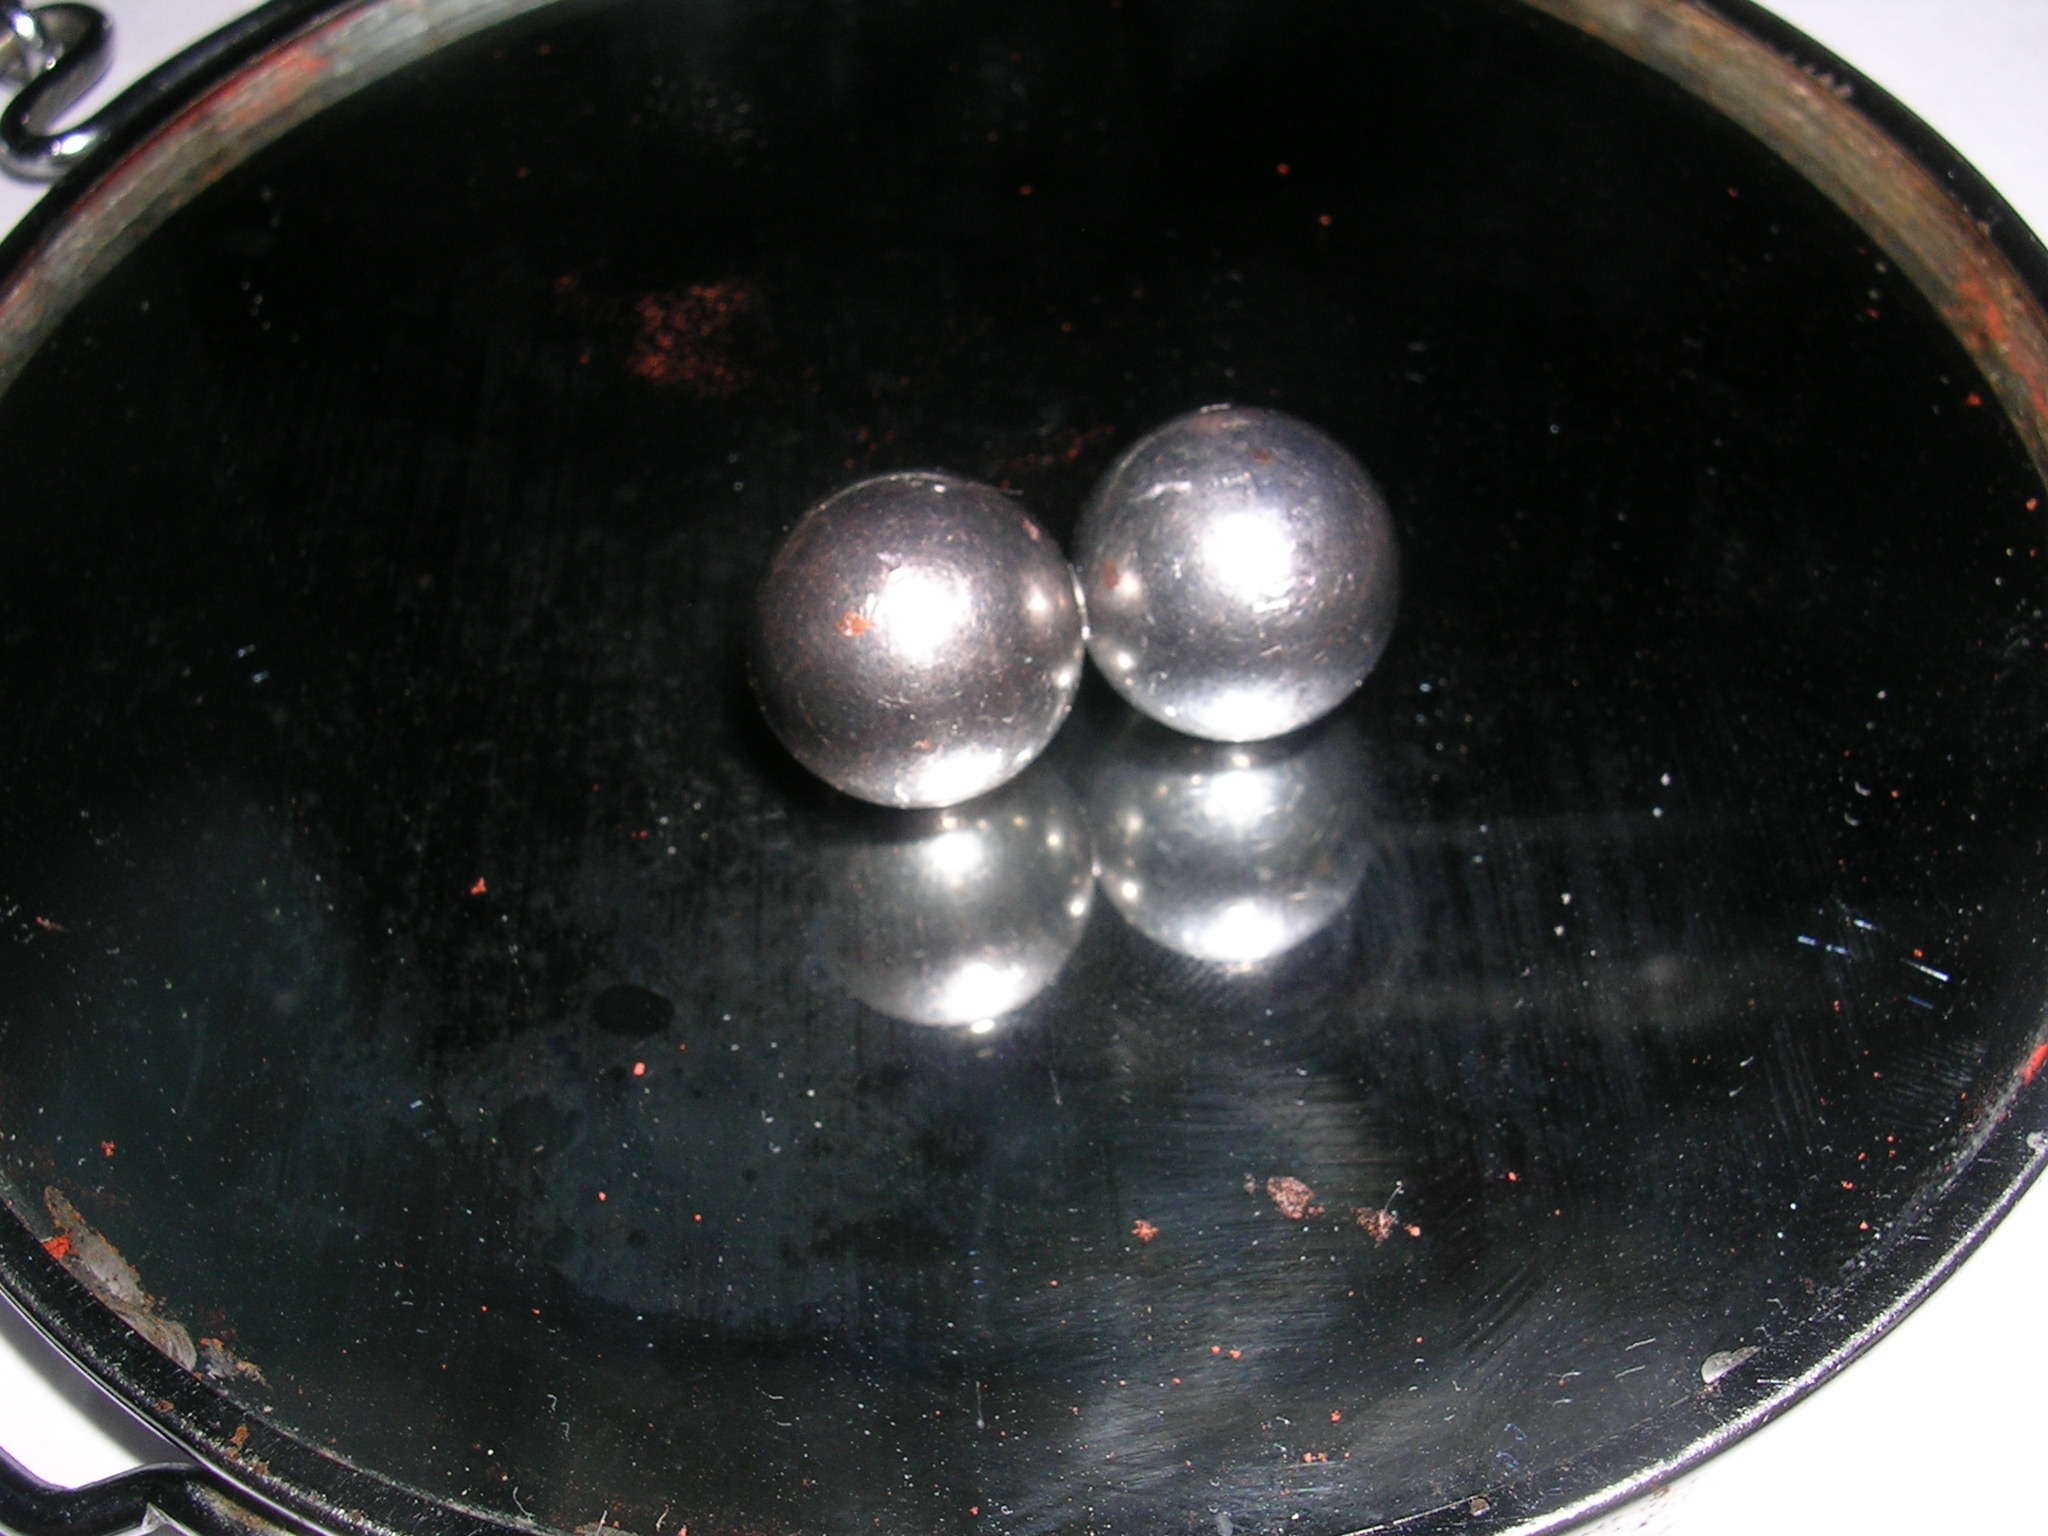 Hurricane Balls, 3000 rpm+ spinning toy.